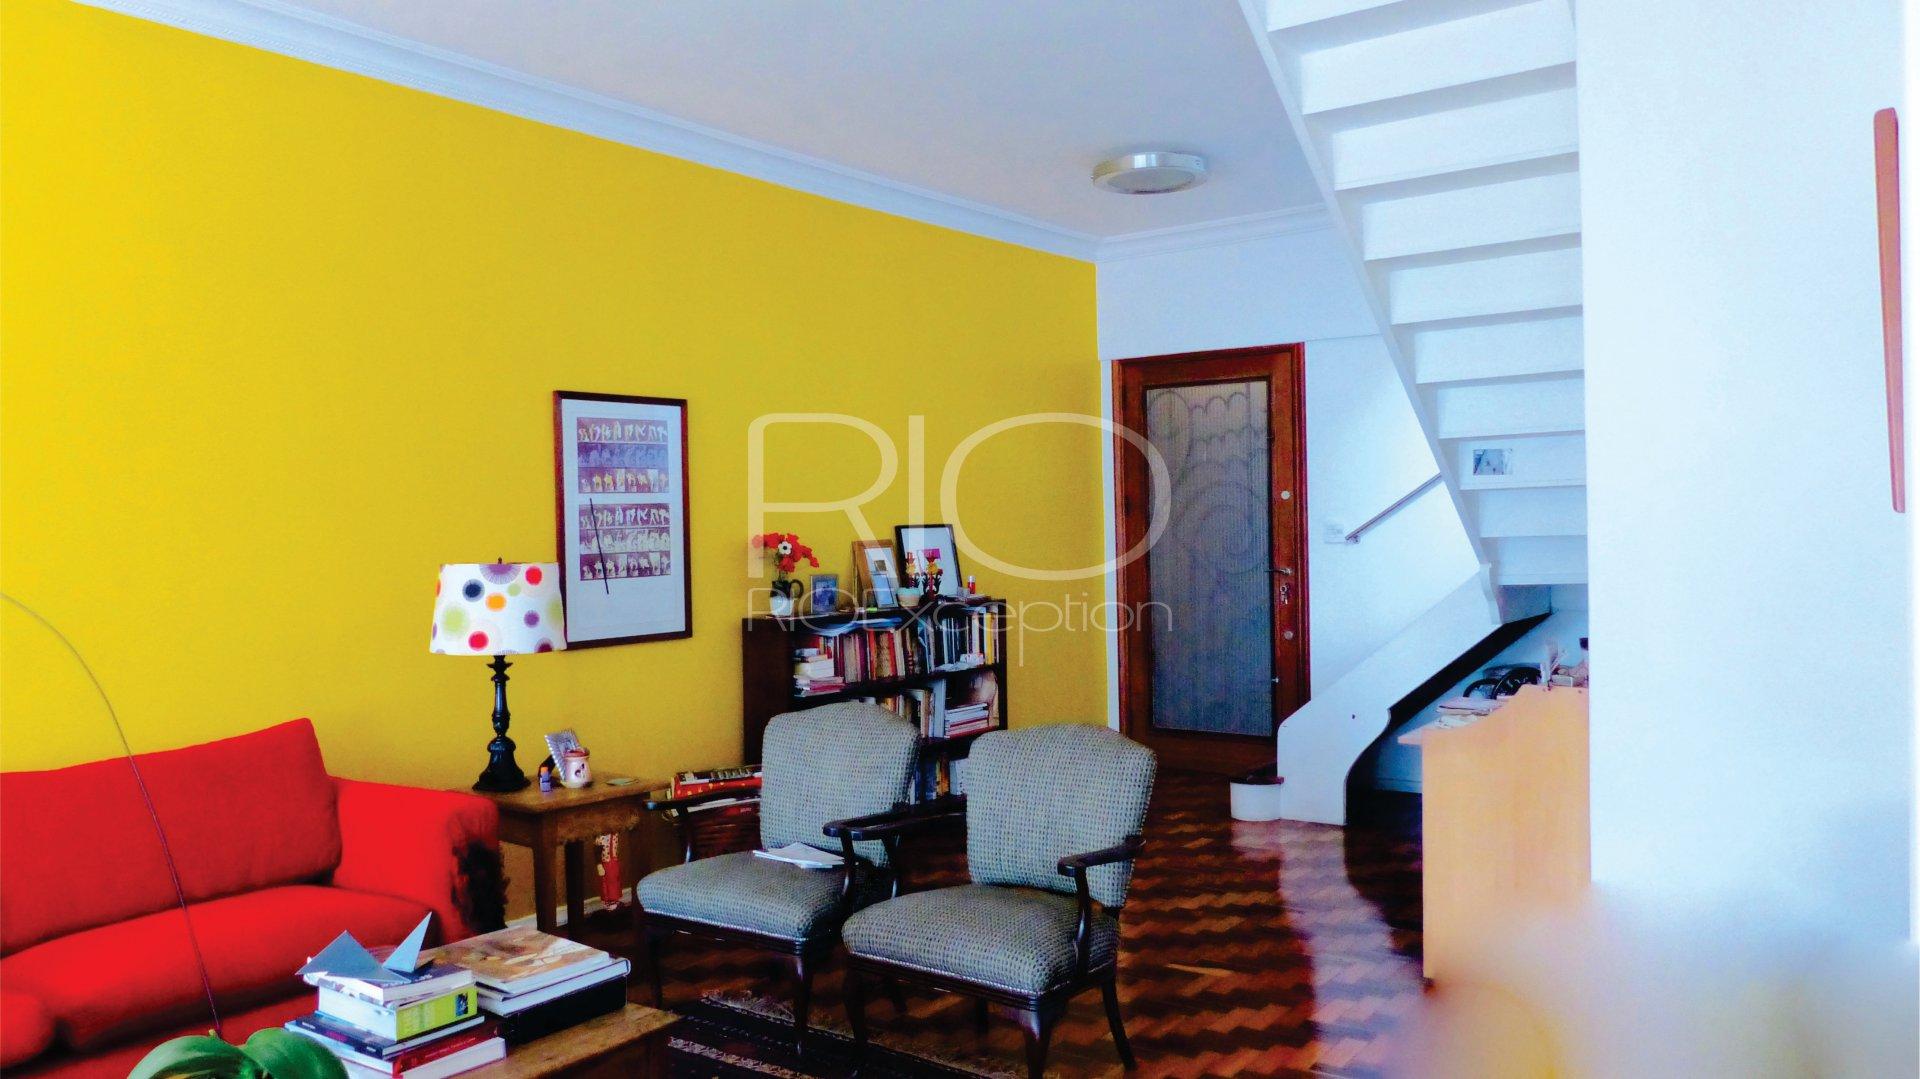 242 m2 Duplex penthouse in Gloria